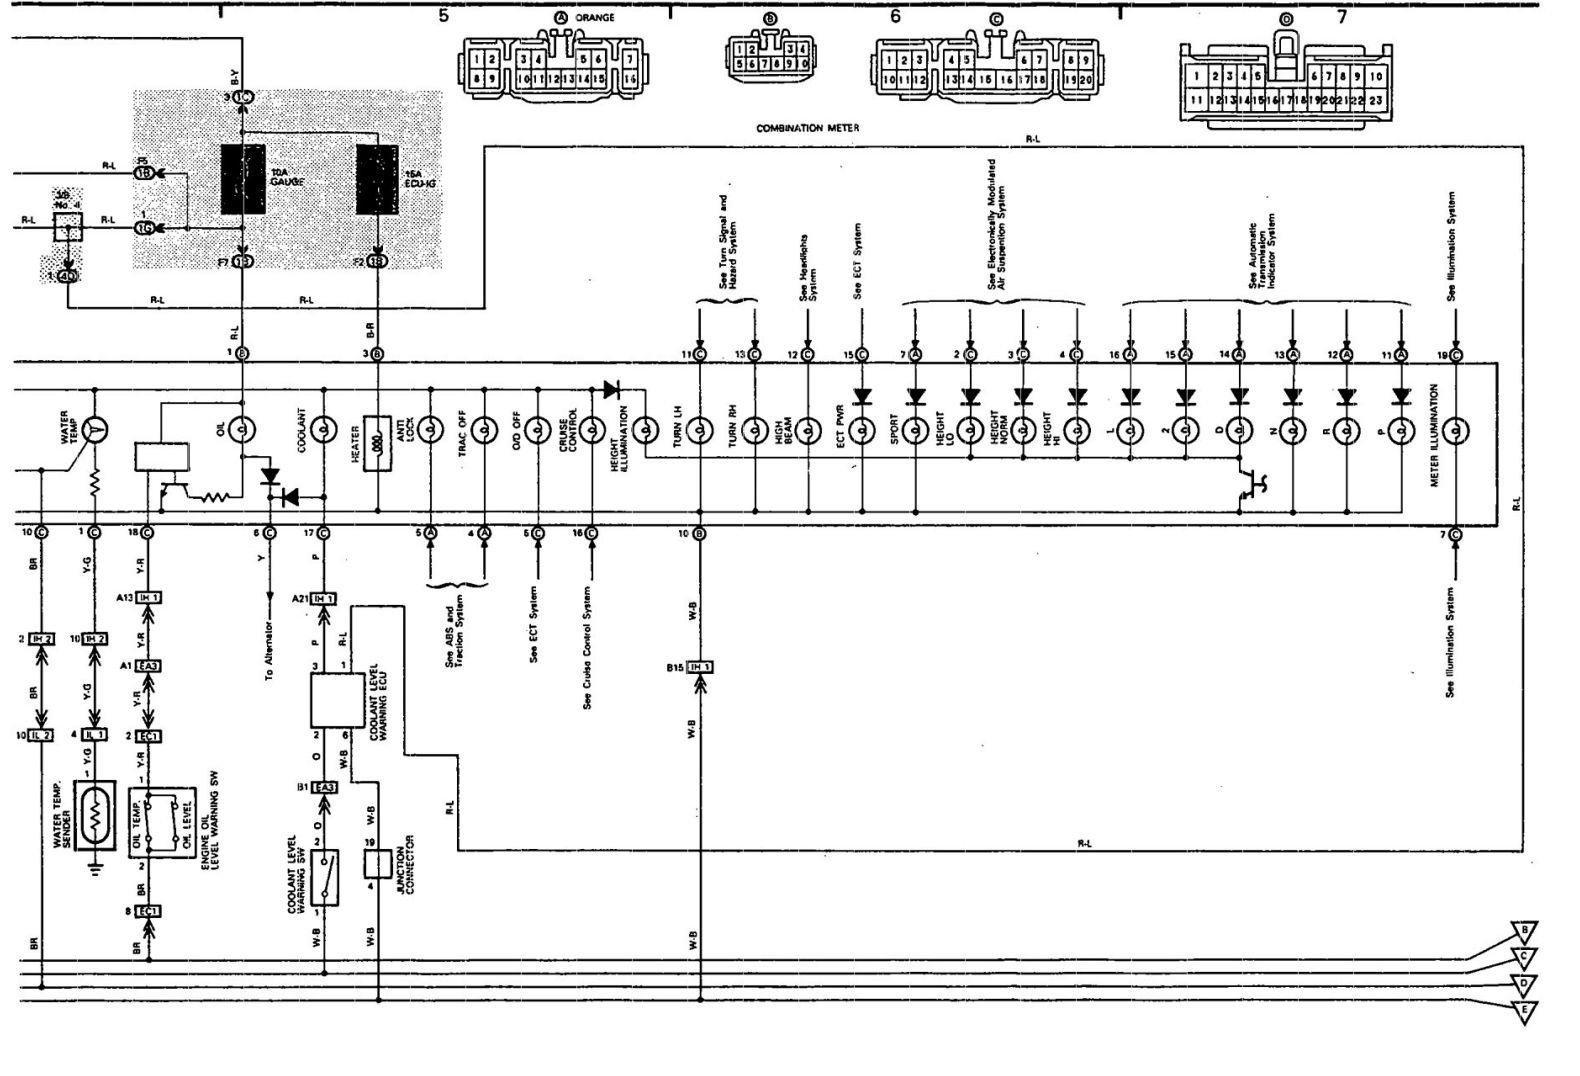 92 Lincoln Town Car Schematic Trusted Schematics Diagram 1980 Wiring Fuse Box